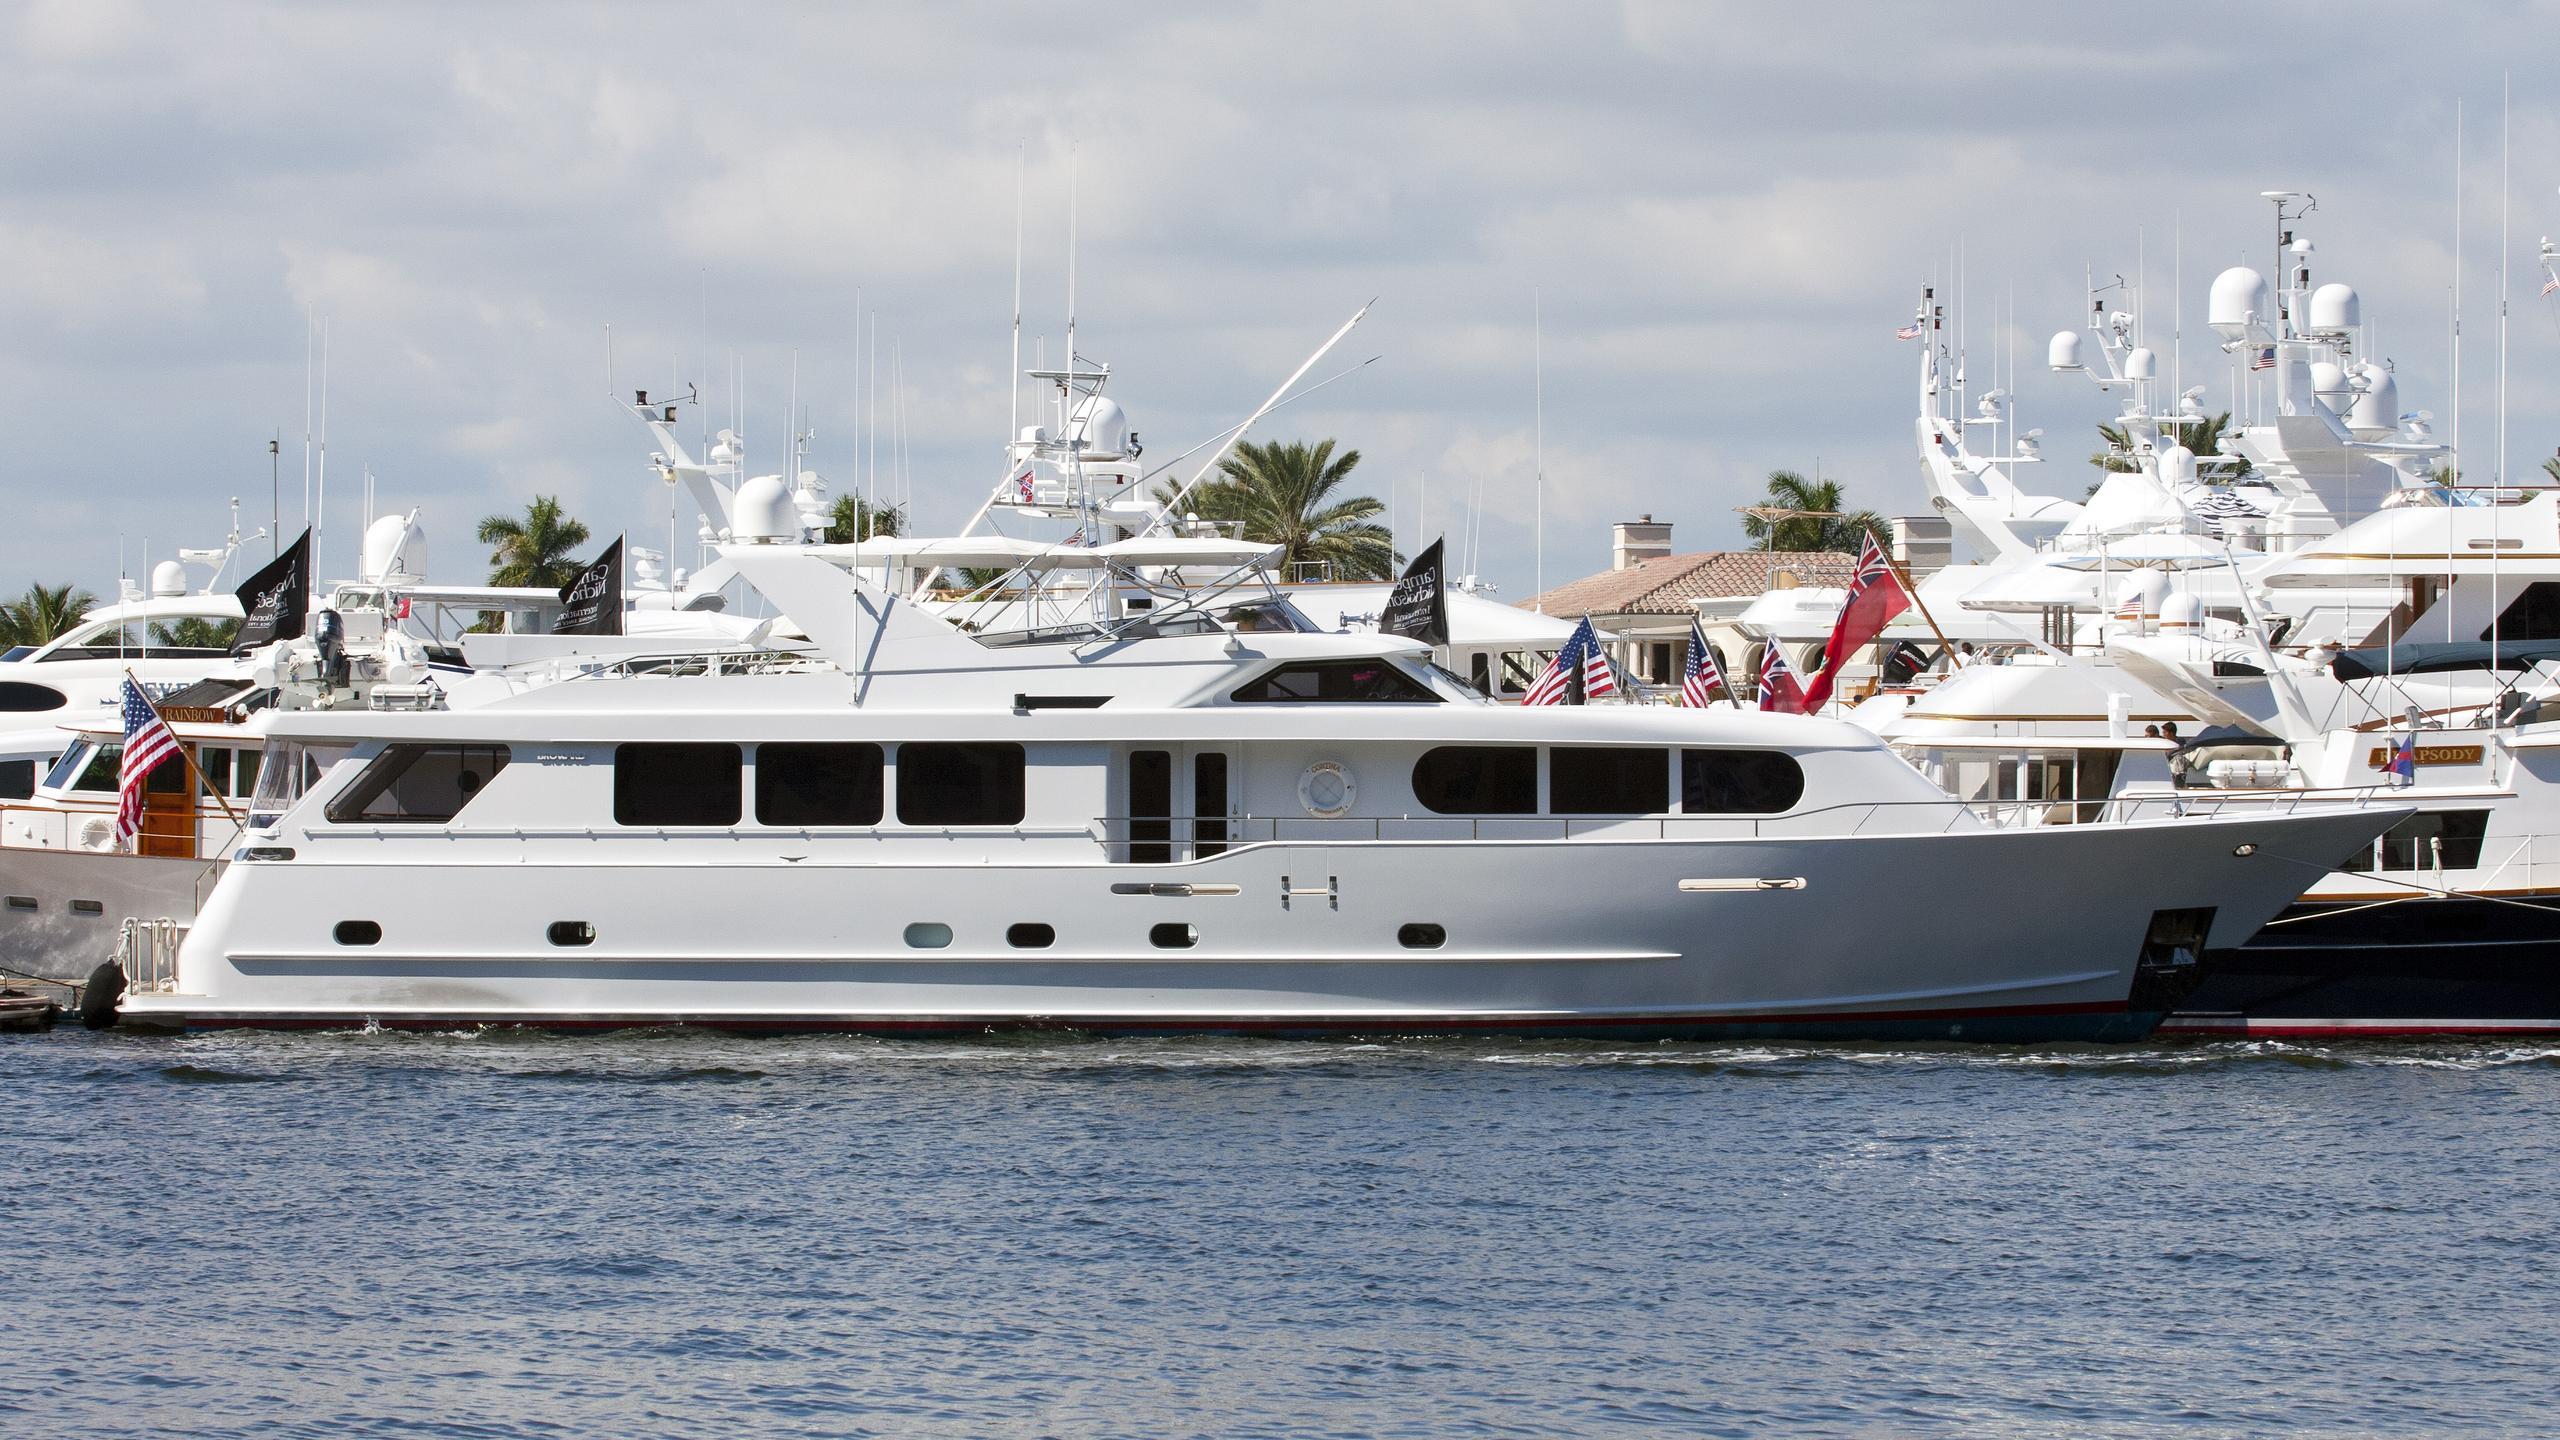 my-lady-motor-yacht-broward-2001-29m-profile